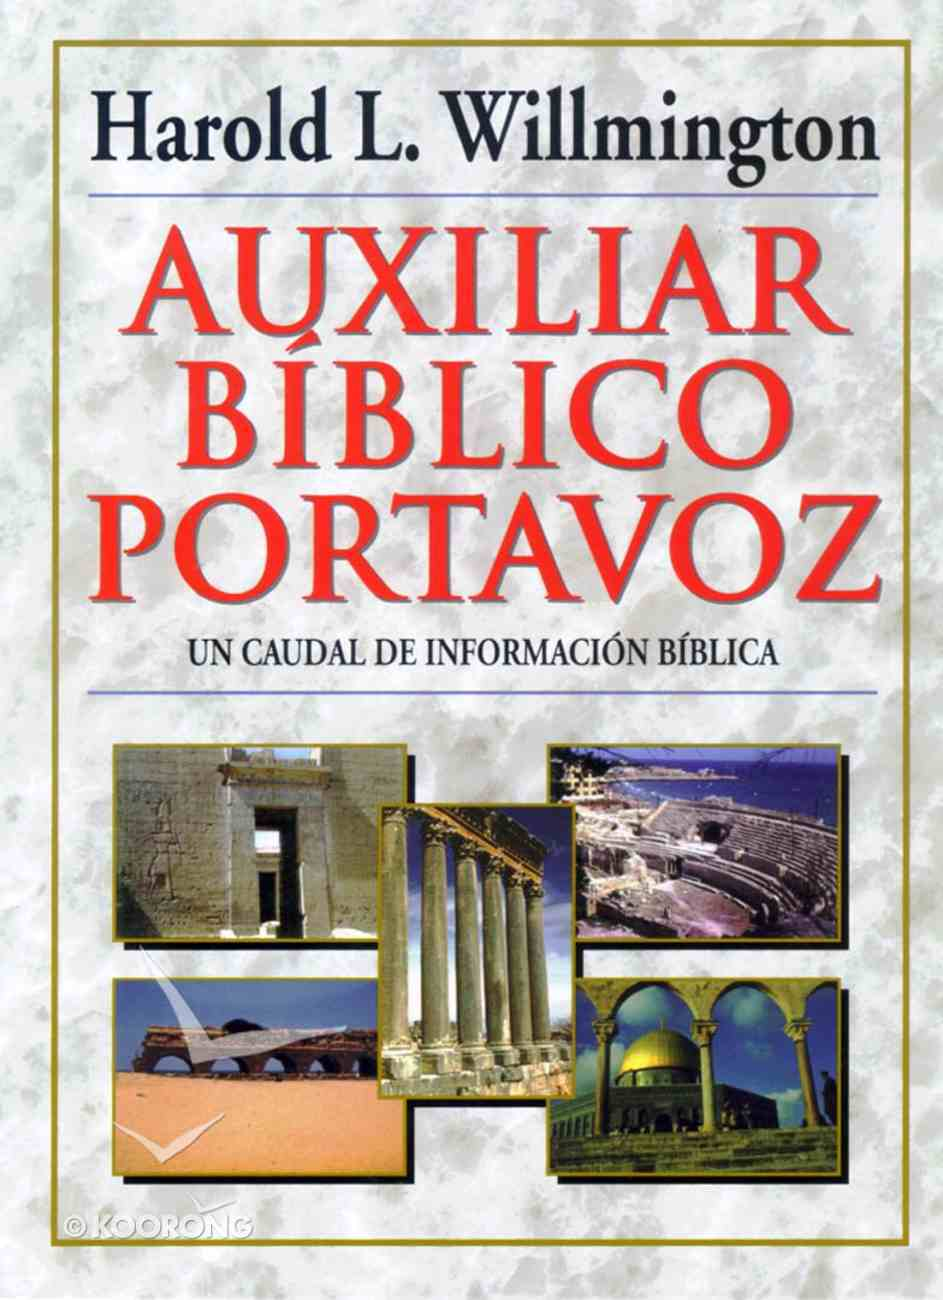 Auxiliar Biblico Portavoz (Willmington's Guide To The Bible) Hardback